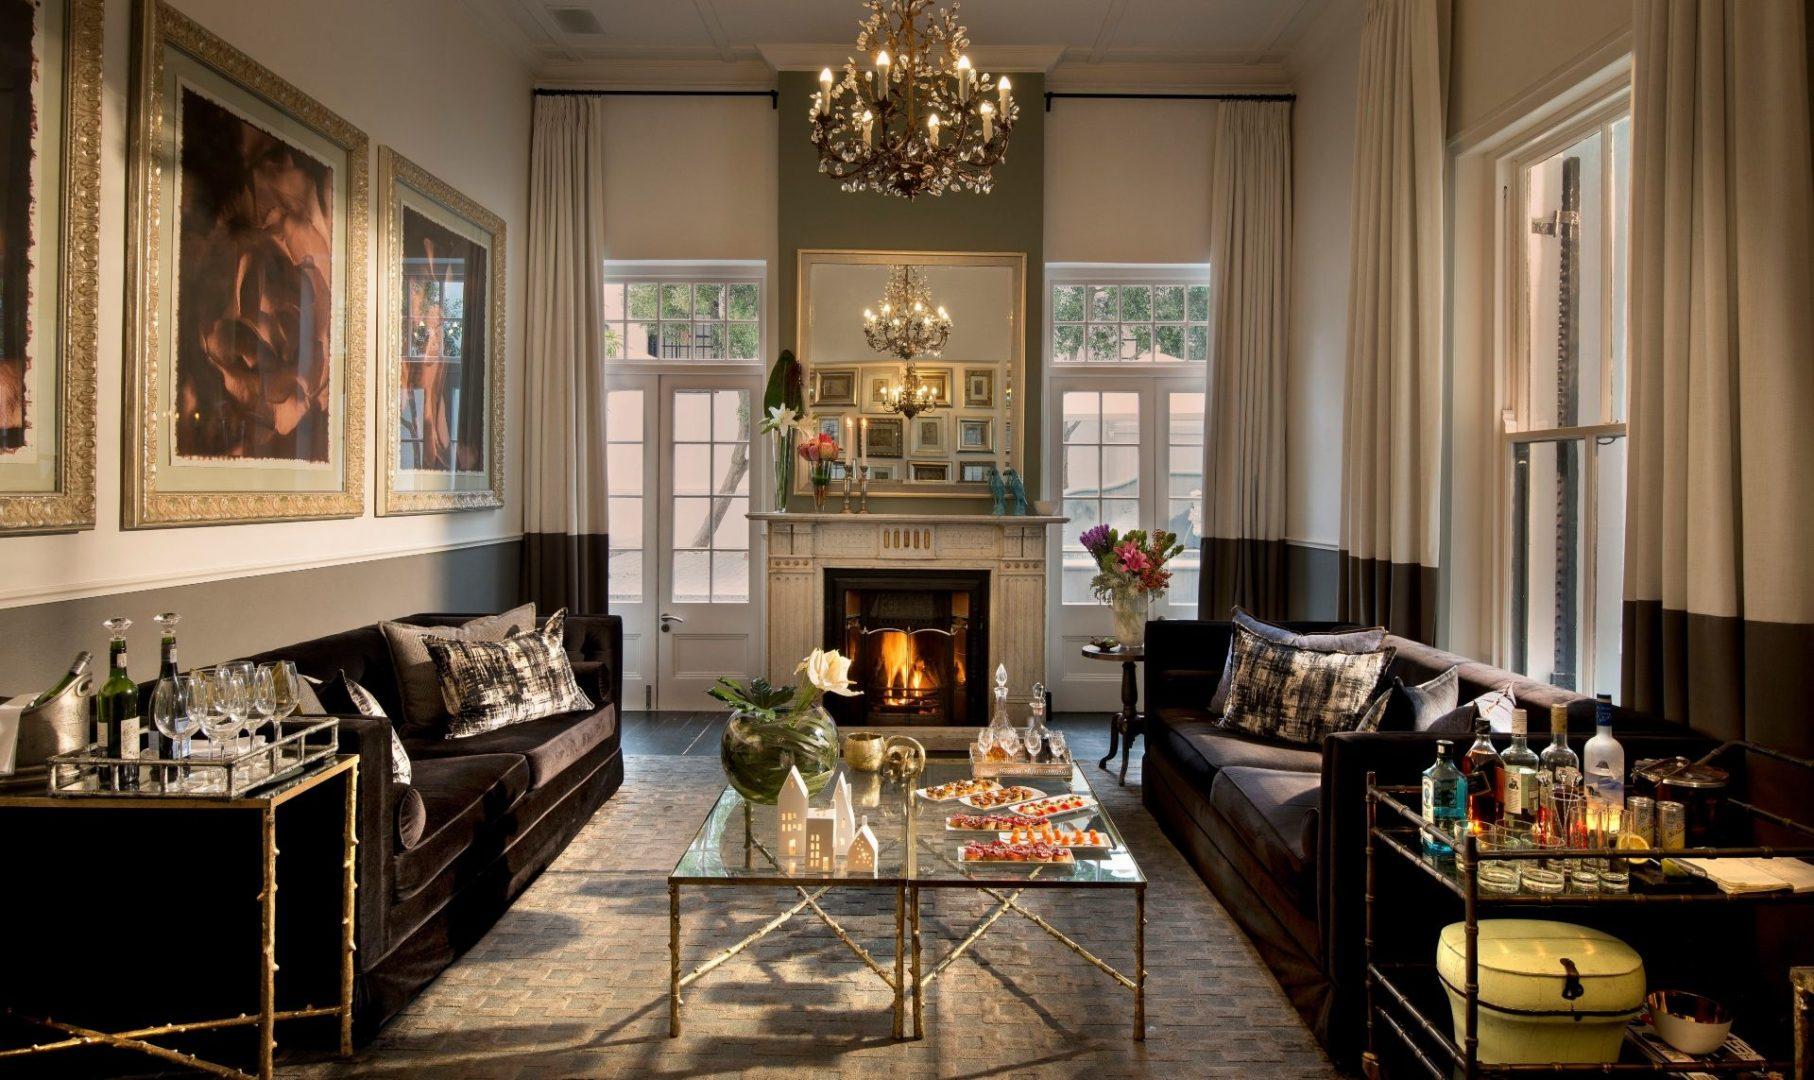 The impressive lounge